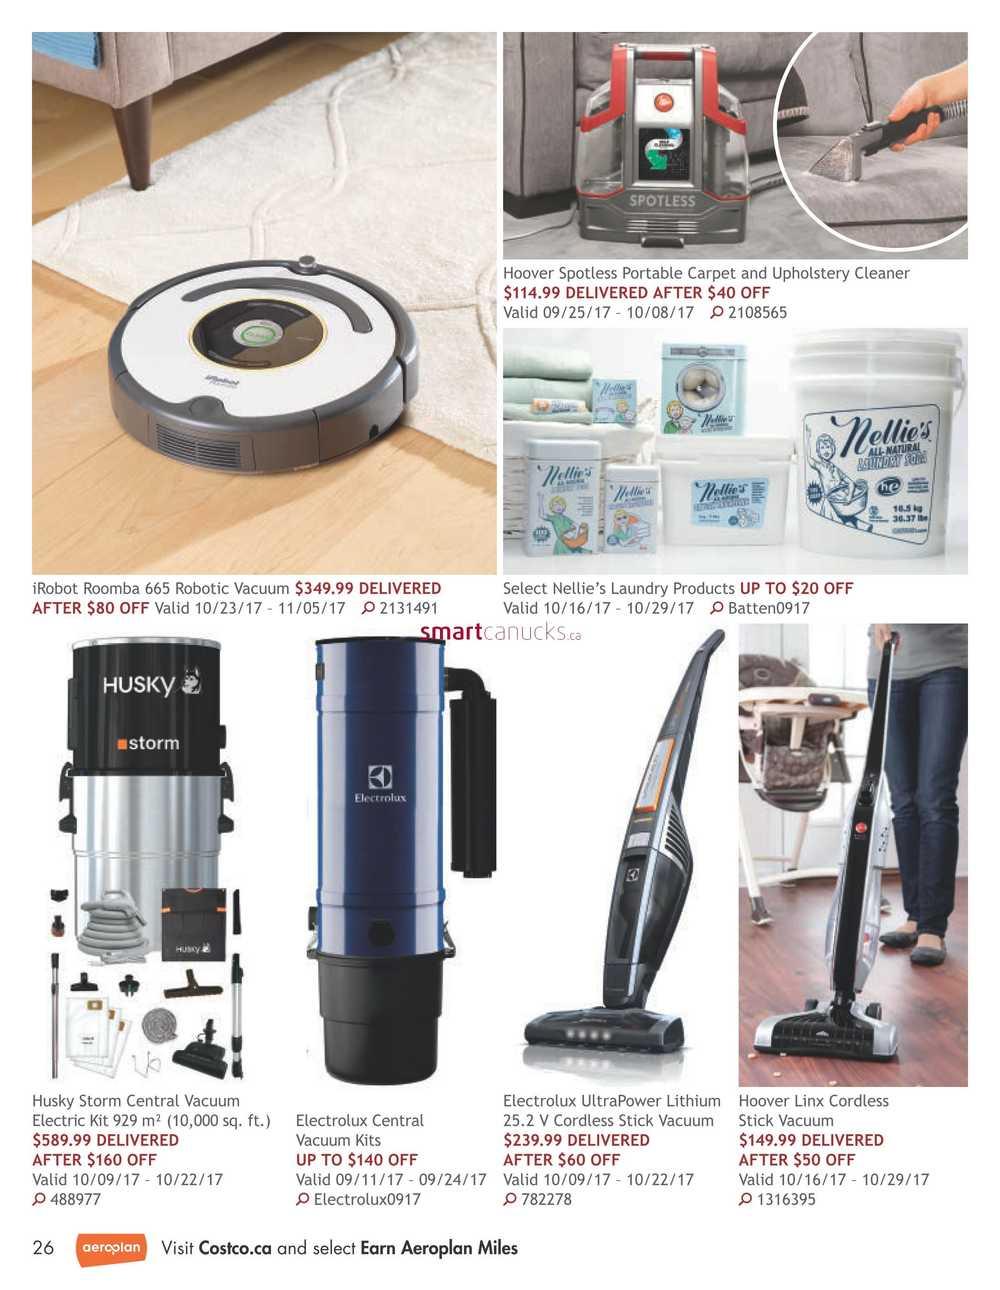 Costco Ca Hoover Carpet Cleaner - Carpet Vidalondon